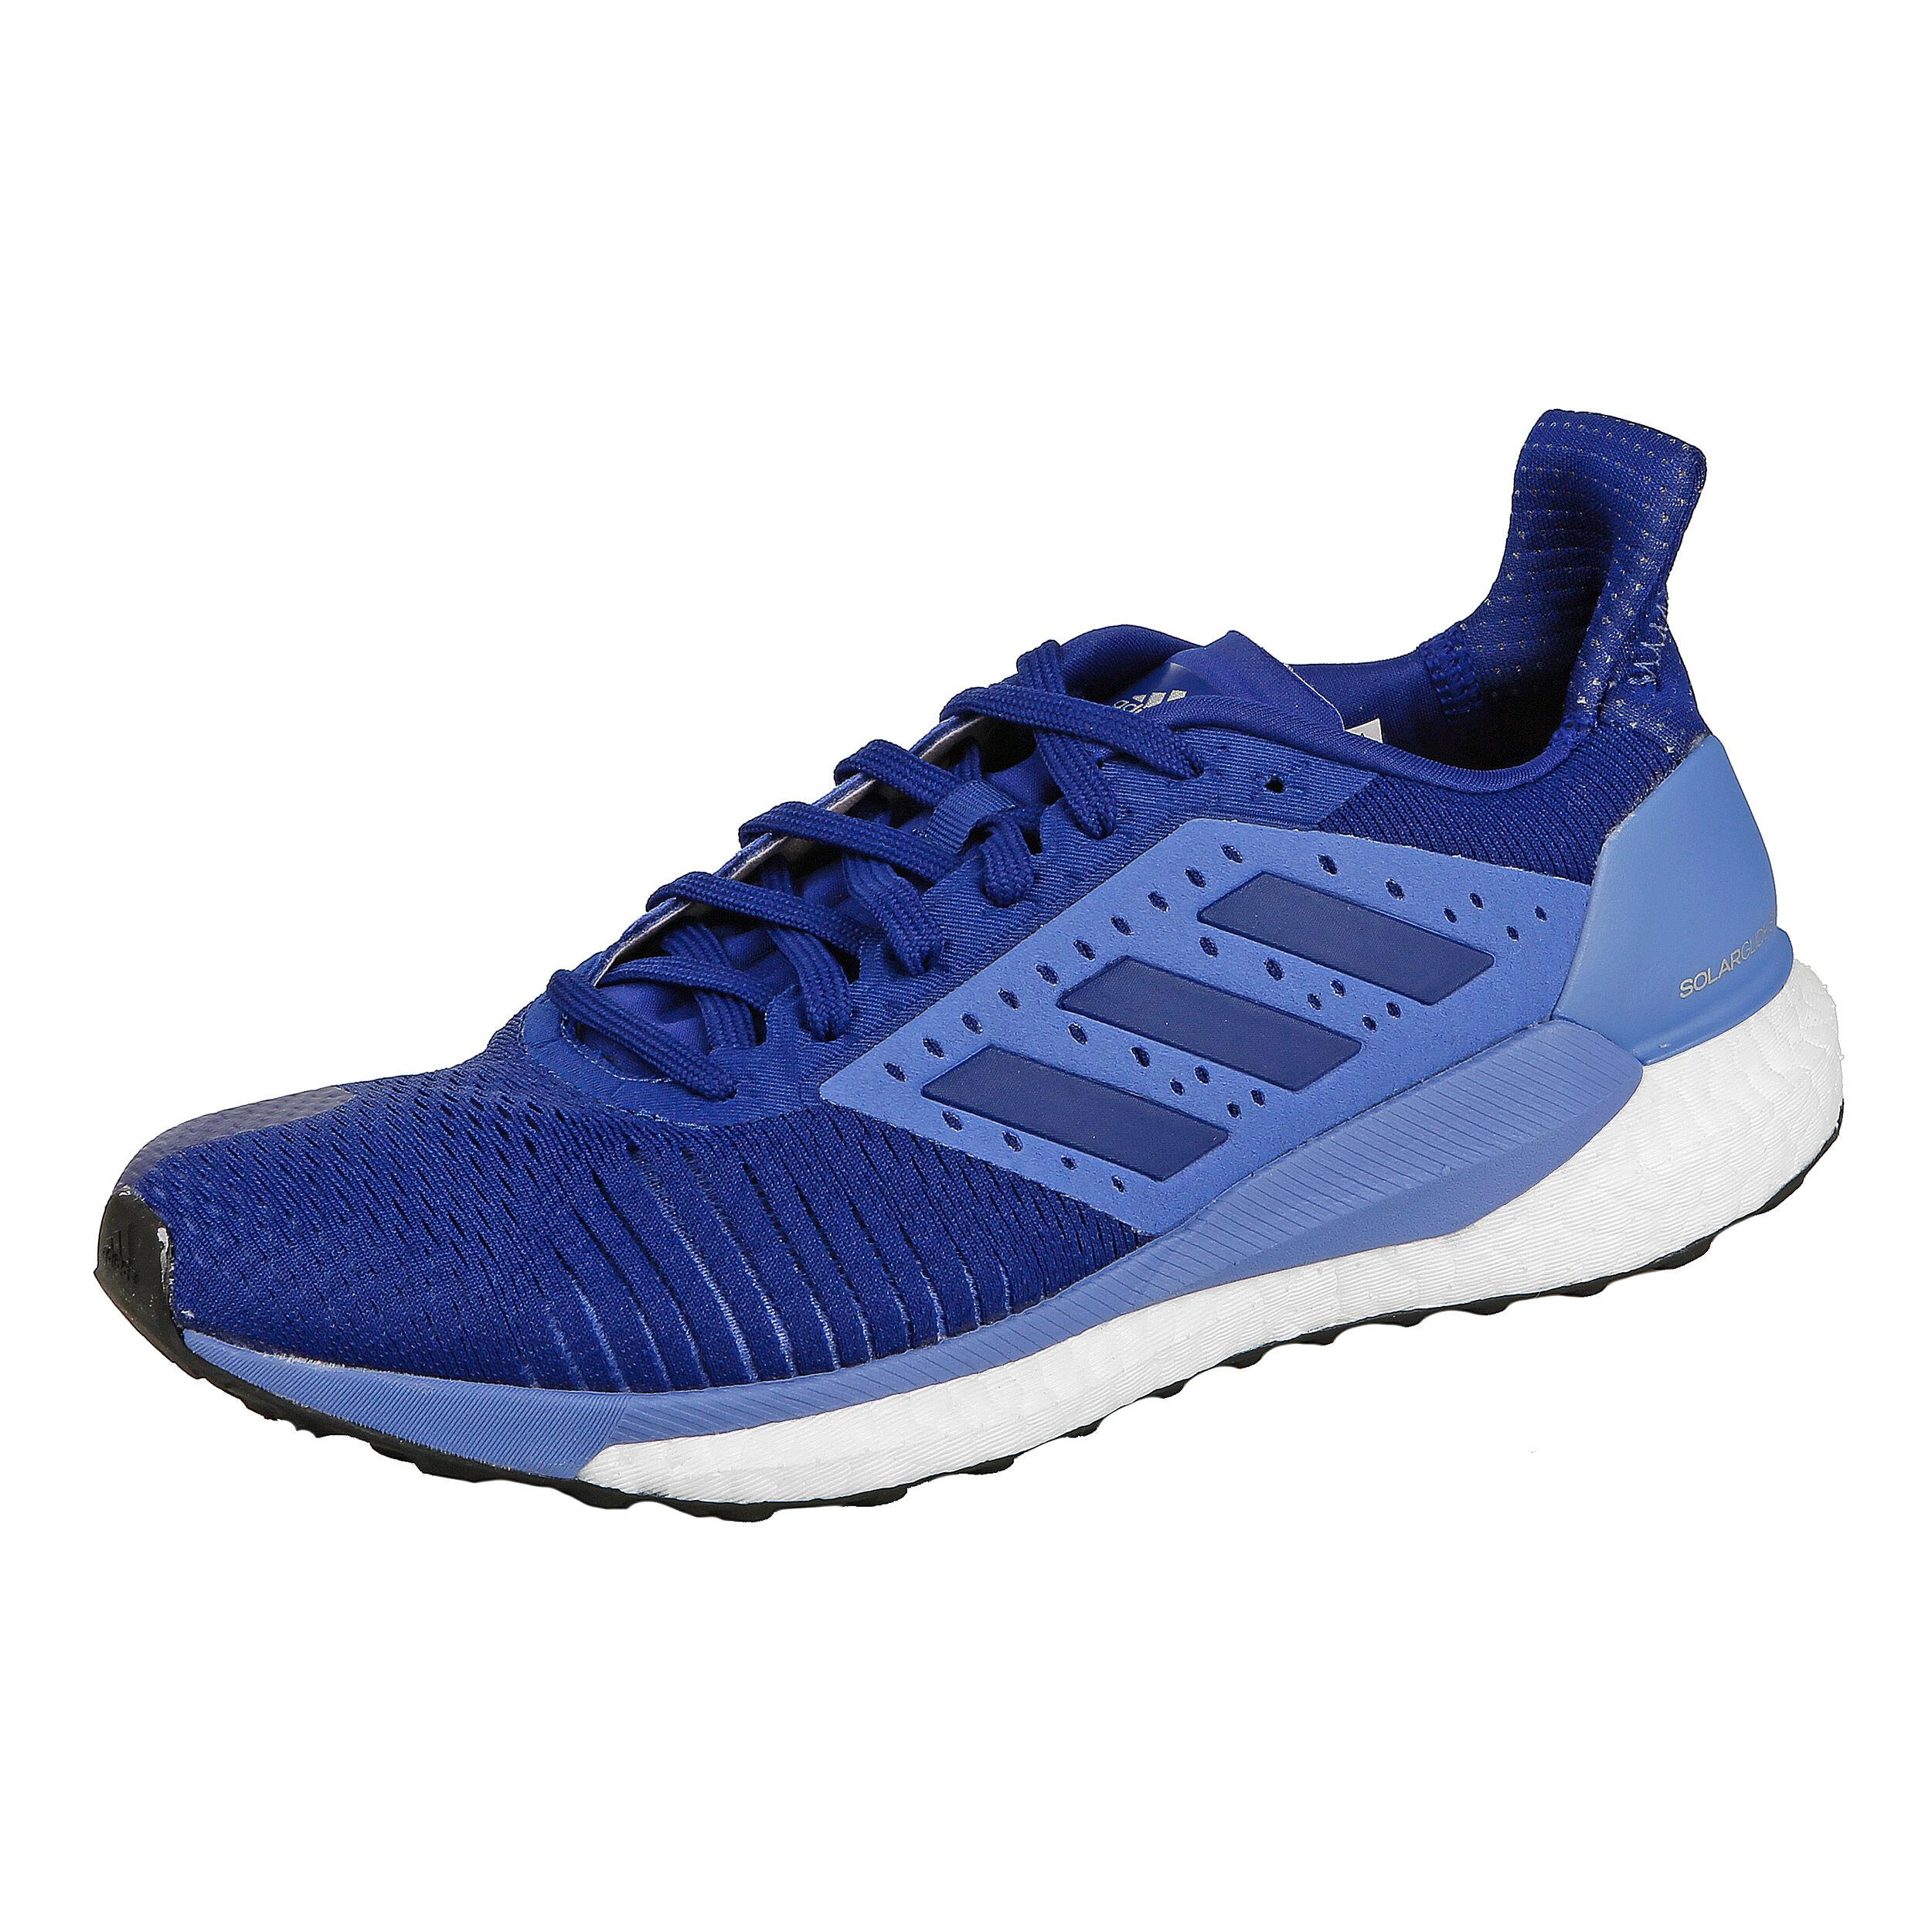 Hochwertig Damen Herren Running Schuhe MYSTERY Blau Adidas